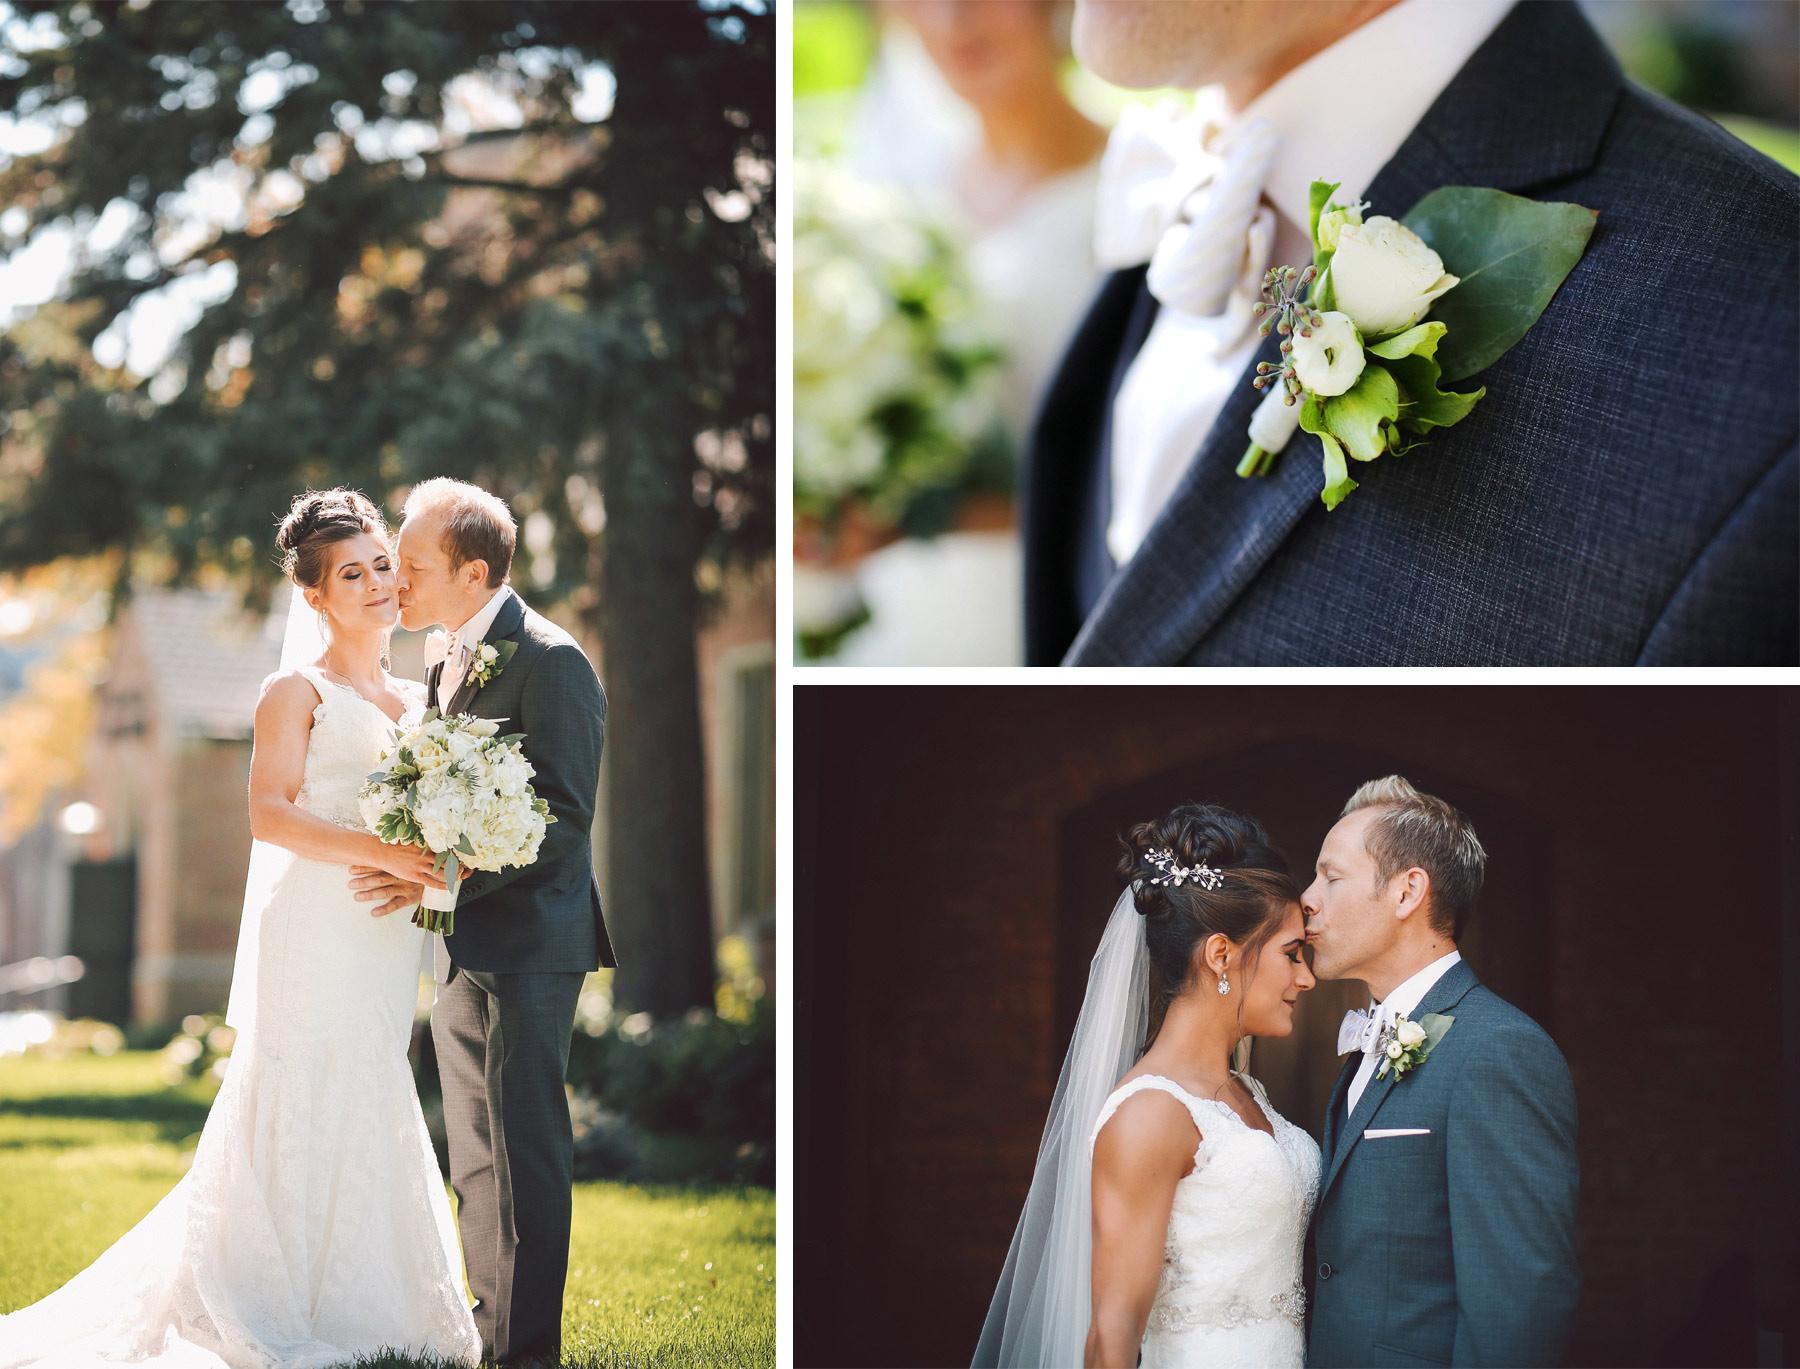 04-Saint-Louis-Park-Minnesota-Wedding-Photographer-by-Andrew-Vick-Photography-Fall-Autumn-Holy-Family-Catholic-Church-First-Meeting-Look-Bride-Groom-Forehead-Kiss-Boutonniere-Flowers-Vintage-Paula-and-Jason.jpg